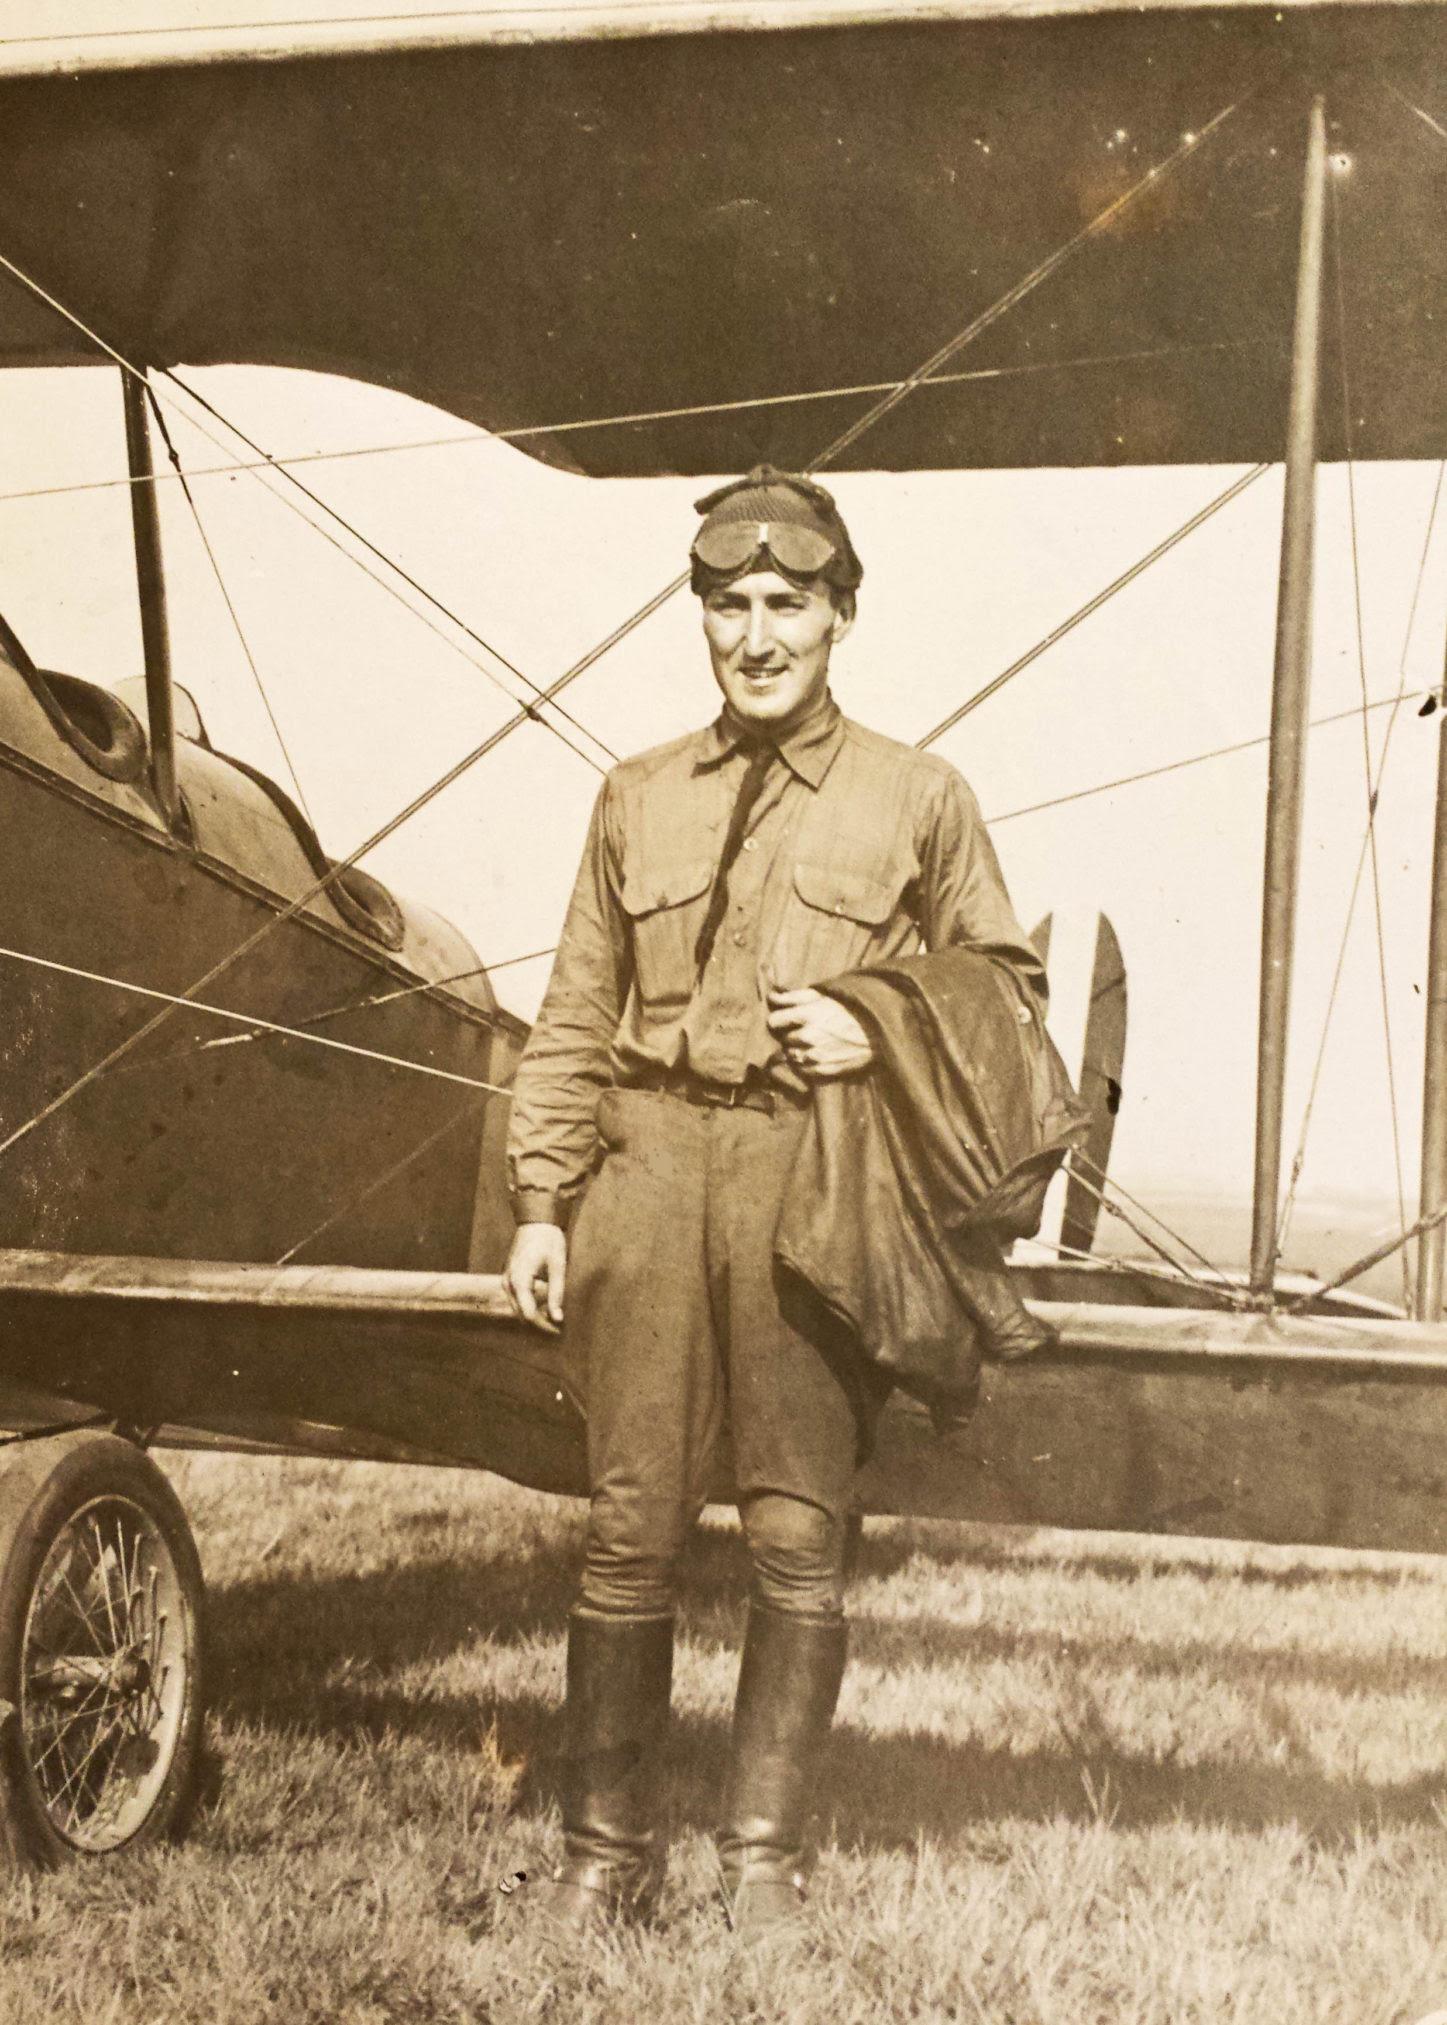 Anson Clark, Mineola, August 4, 1918